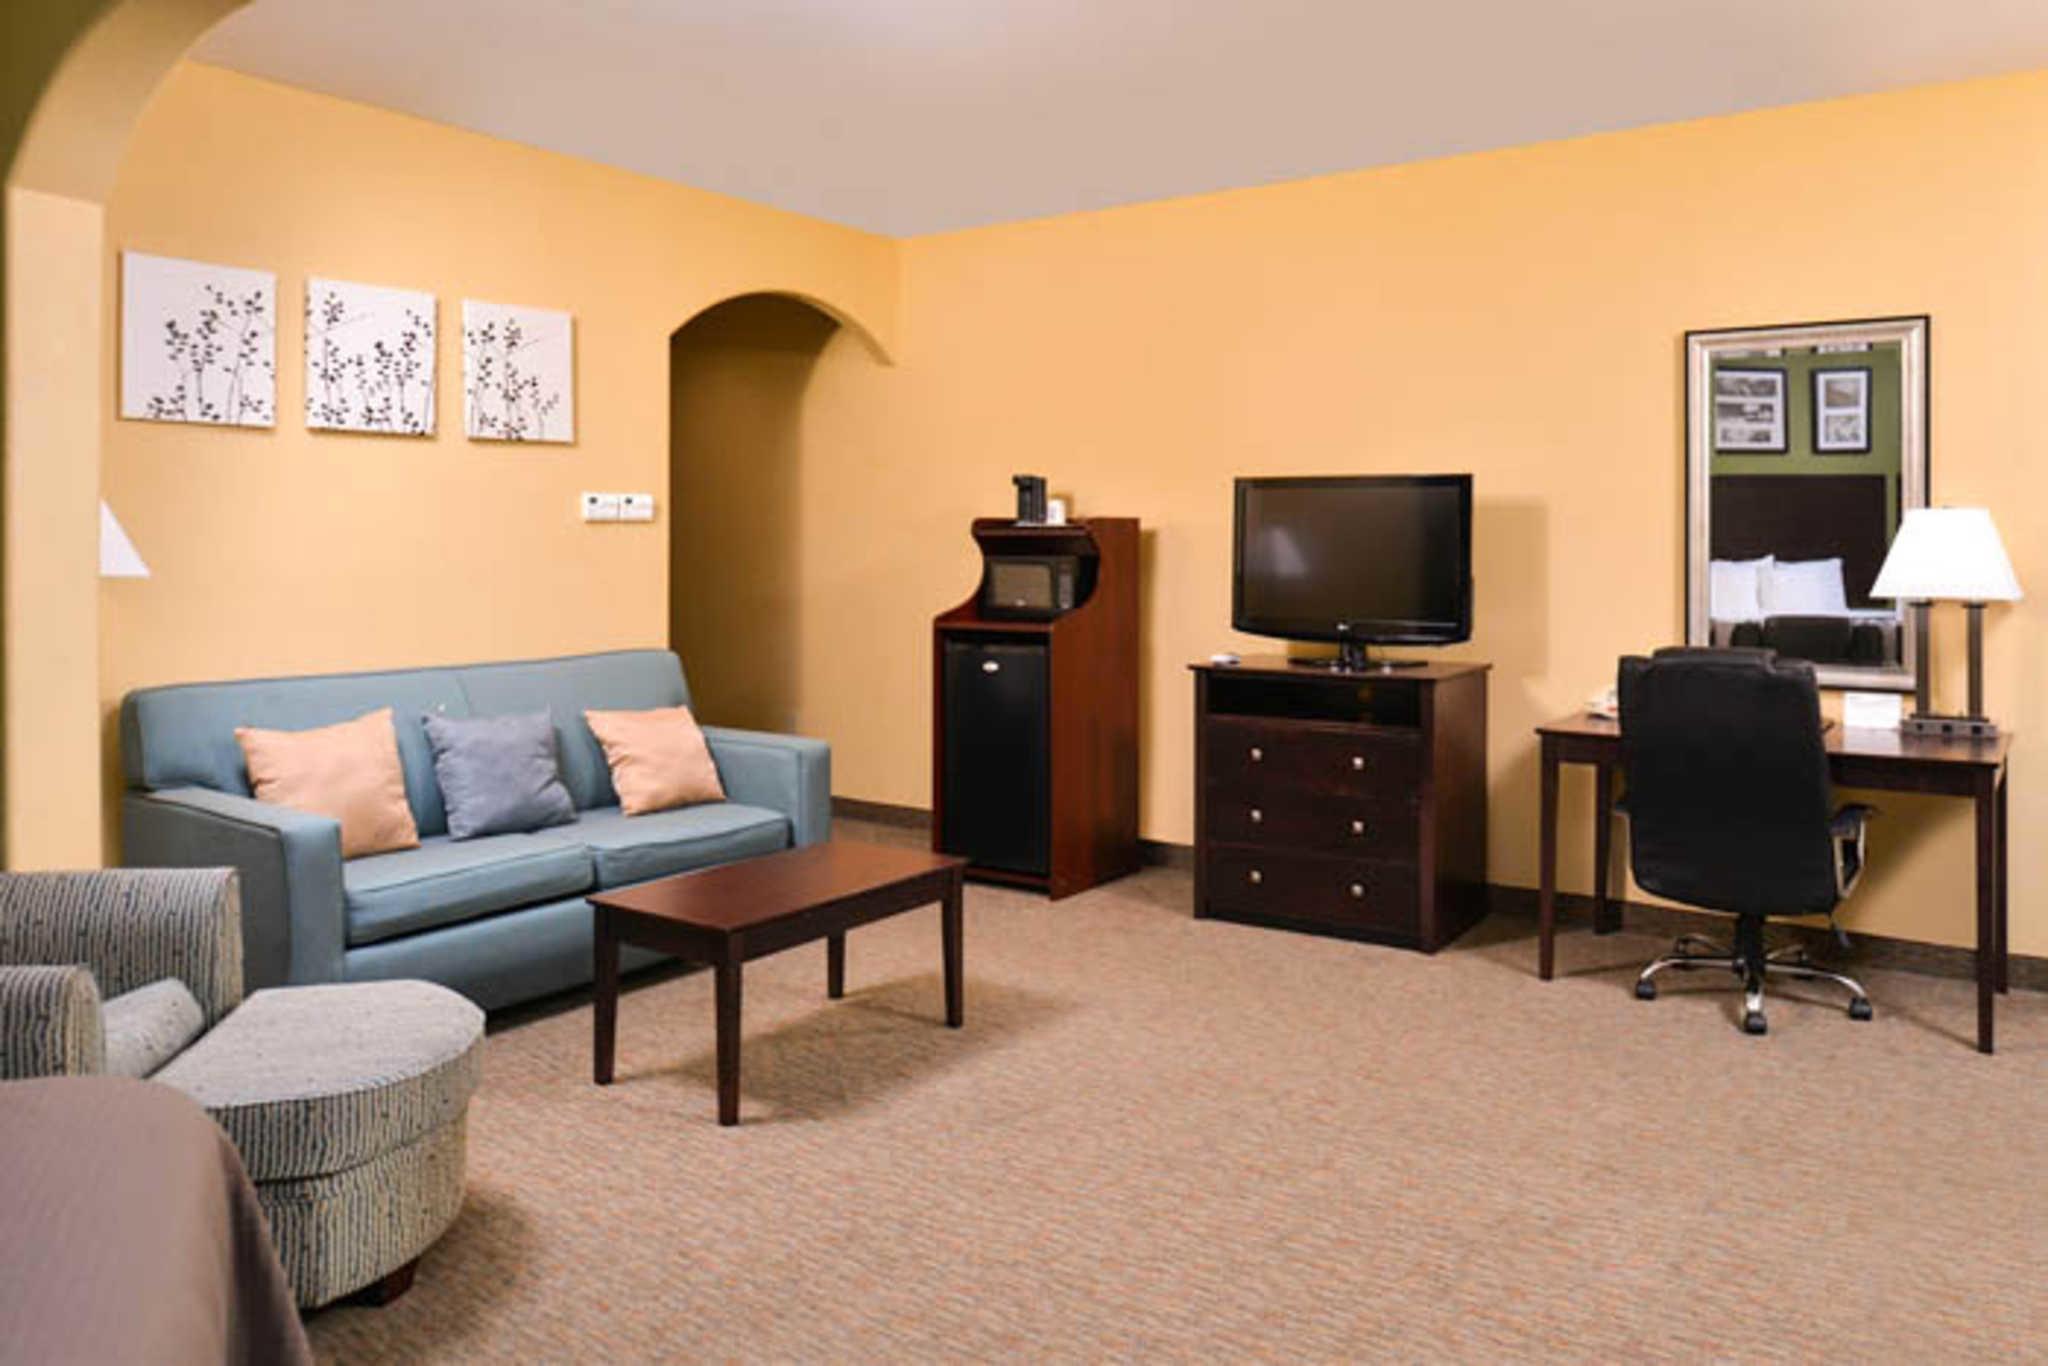 Sleep Inn & Suites Near Downtown North image 17